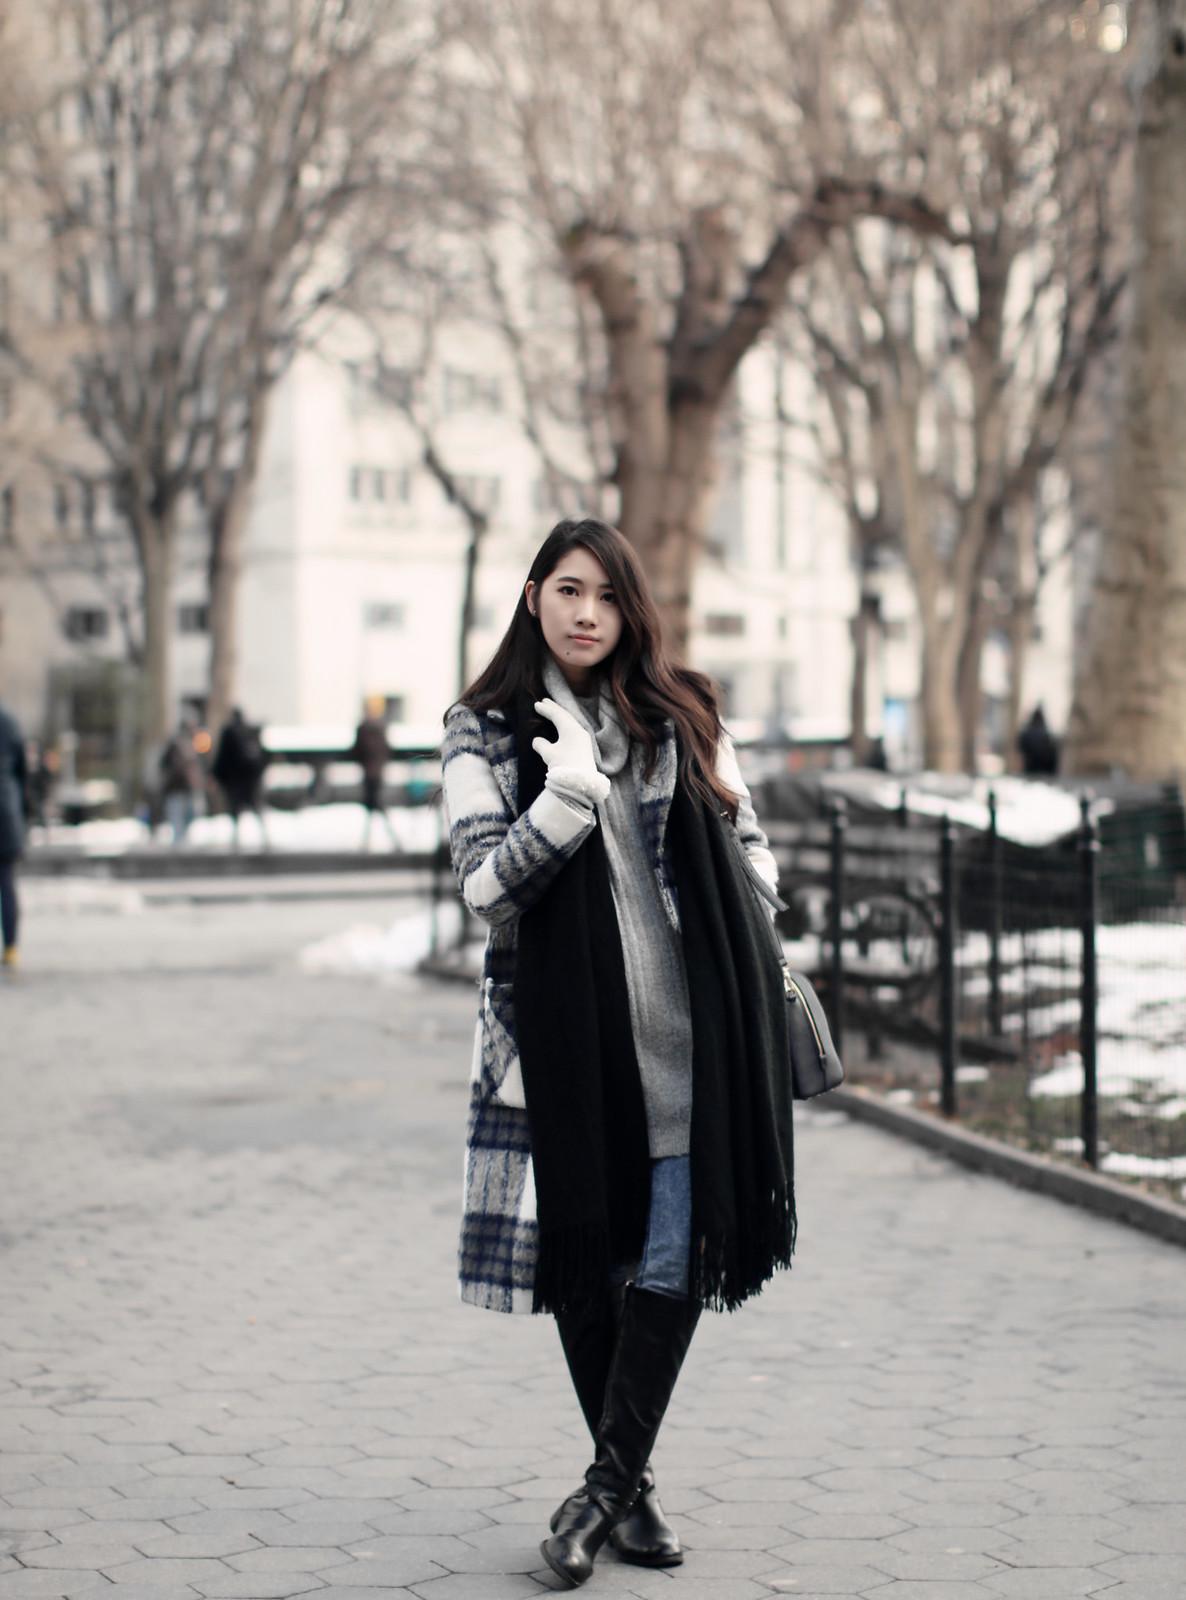 2082-clothestoyouuu-elizabeeetht-nyfw-newyorkfashionweek-nyc-fashionweek-newyork- winter2017-fashion-ootd